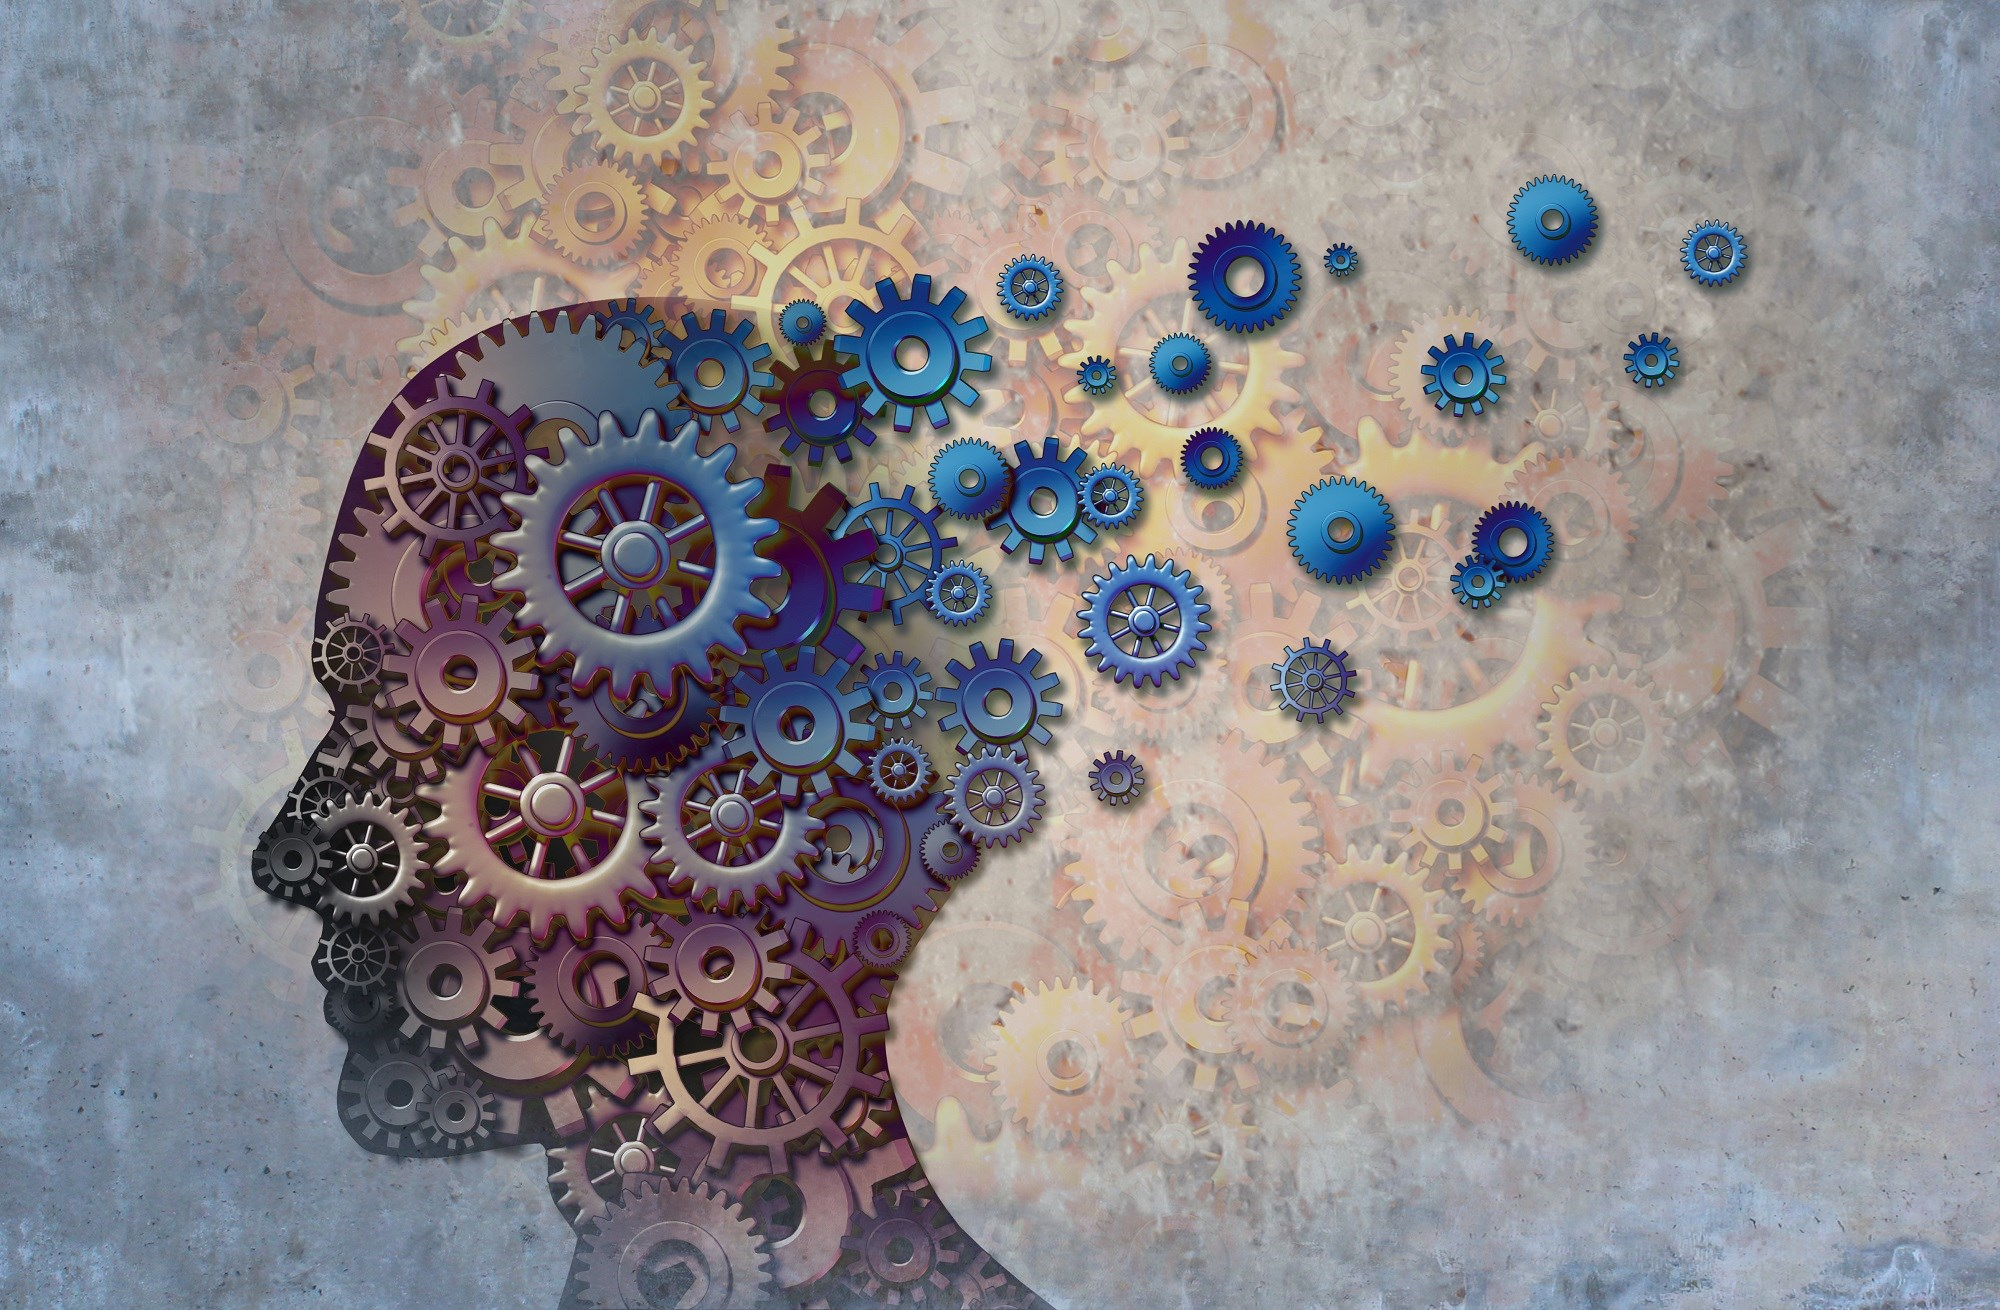 Using Rheumatoid Arthritis as a Model for Treatment Development in Dementia